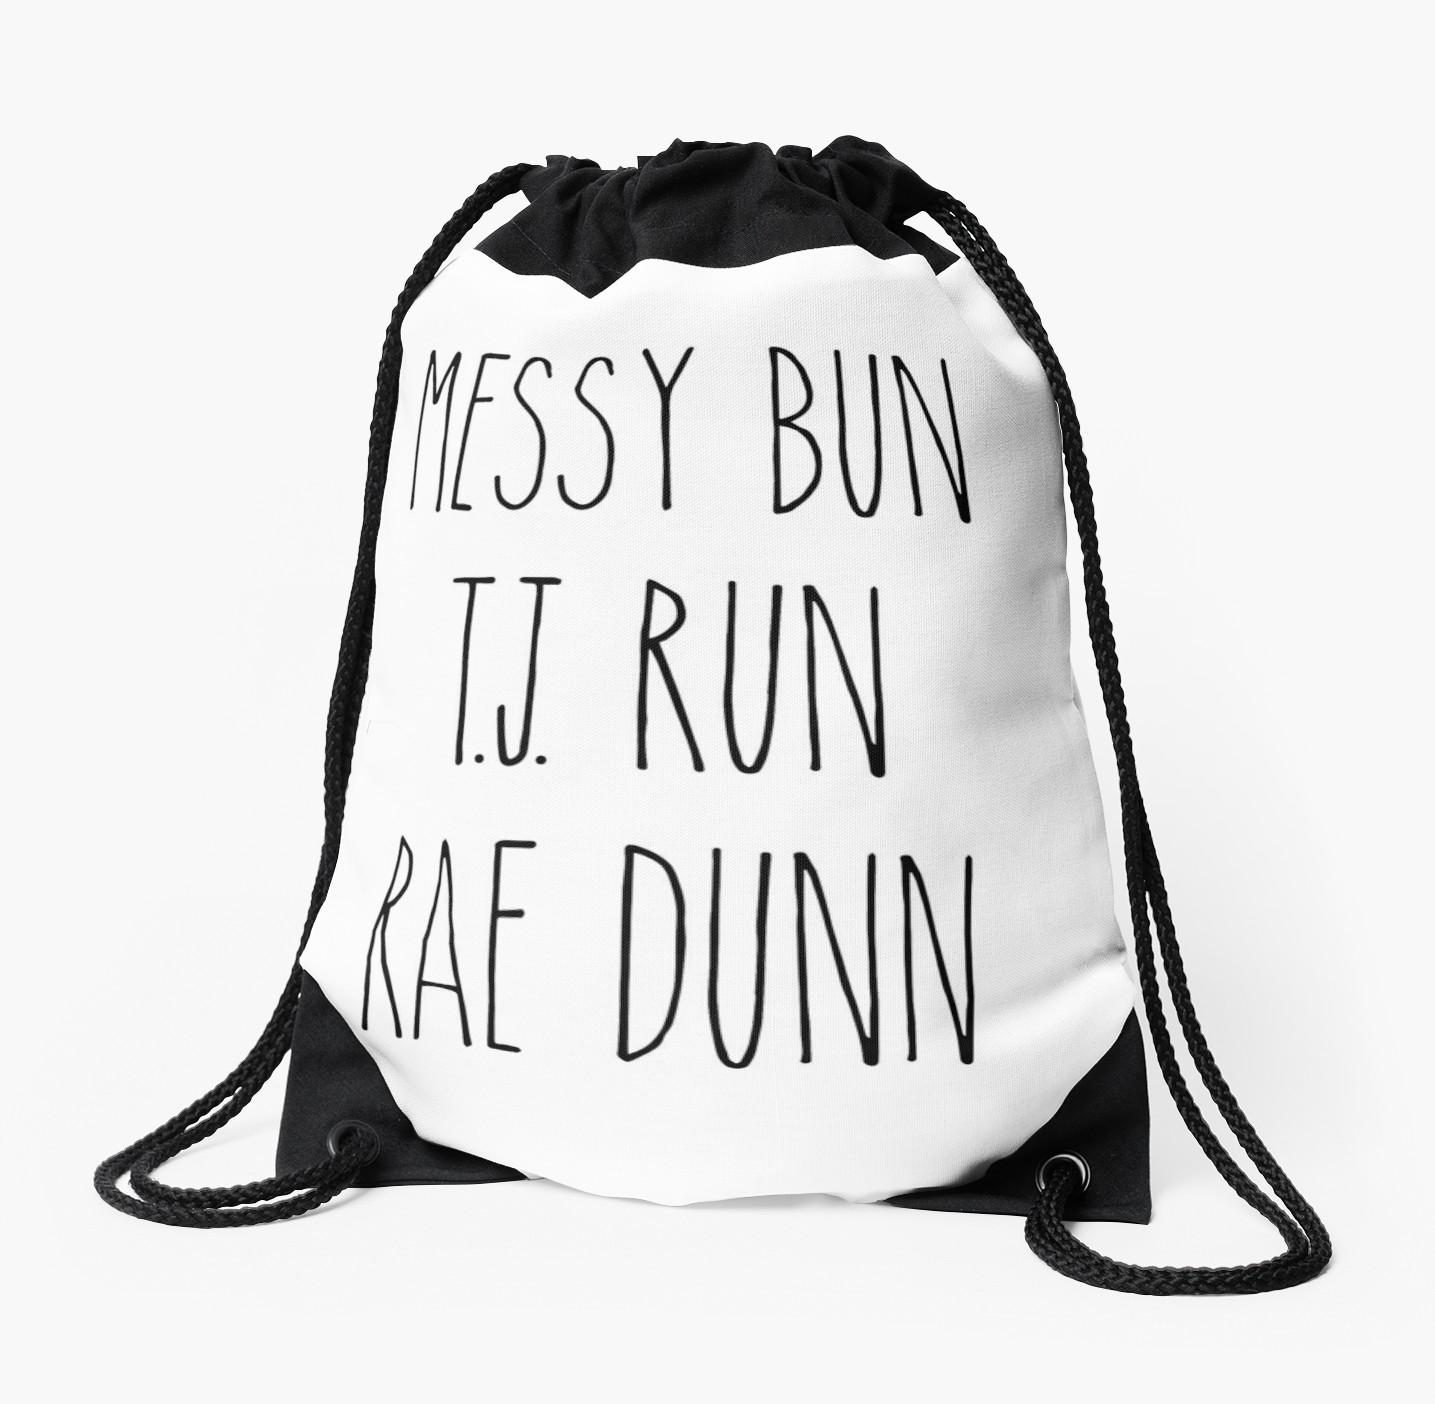 1435x1404 Messy Bun, T.j. Run, Rae Dunn Drawstring Bags By Kjanedesigns